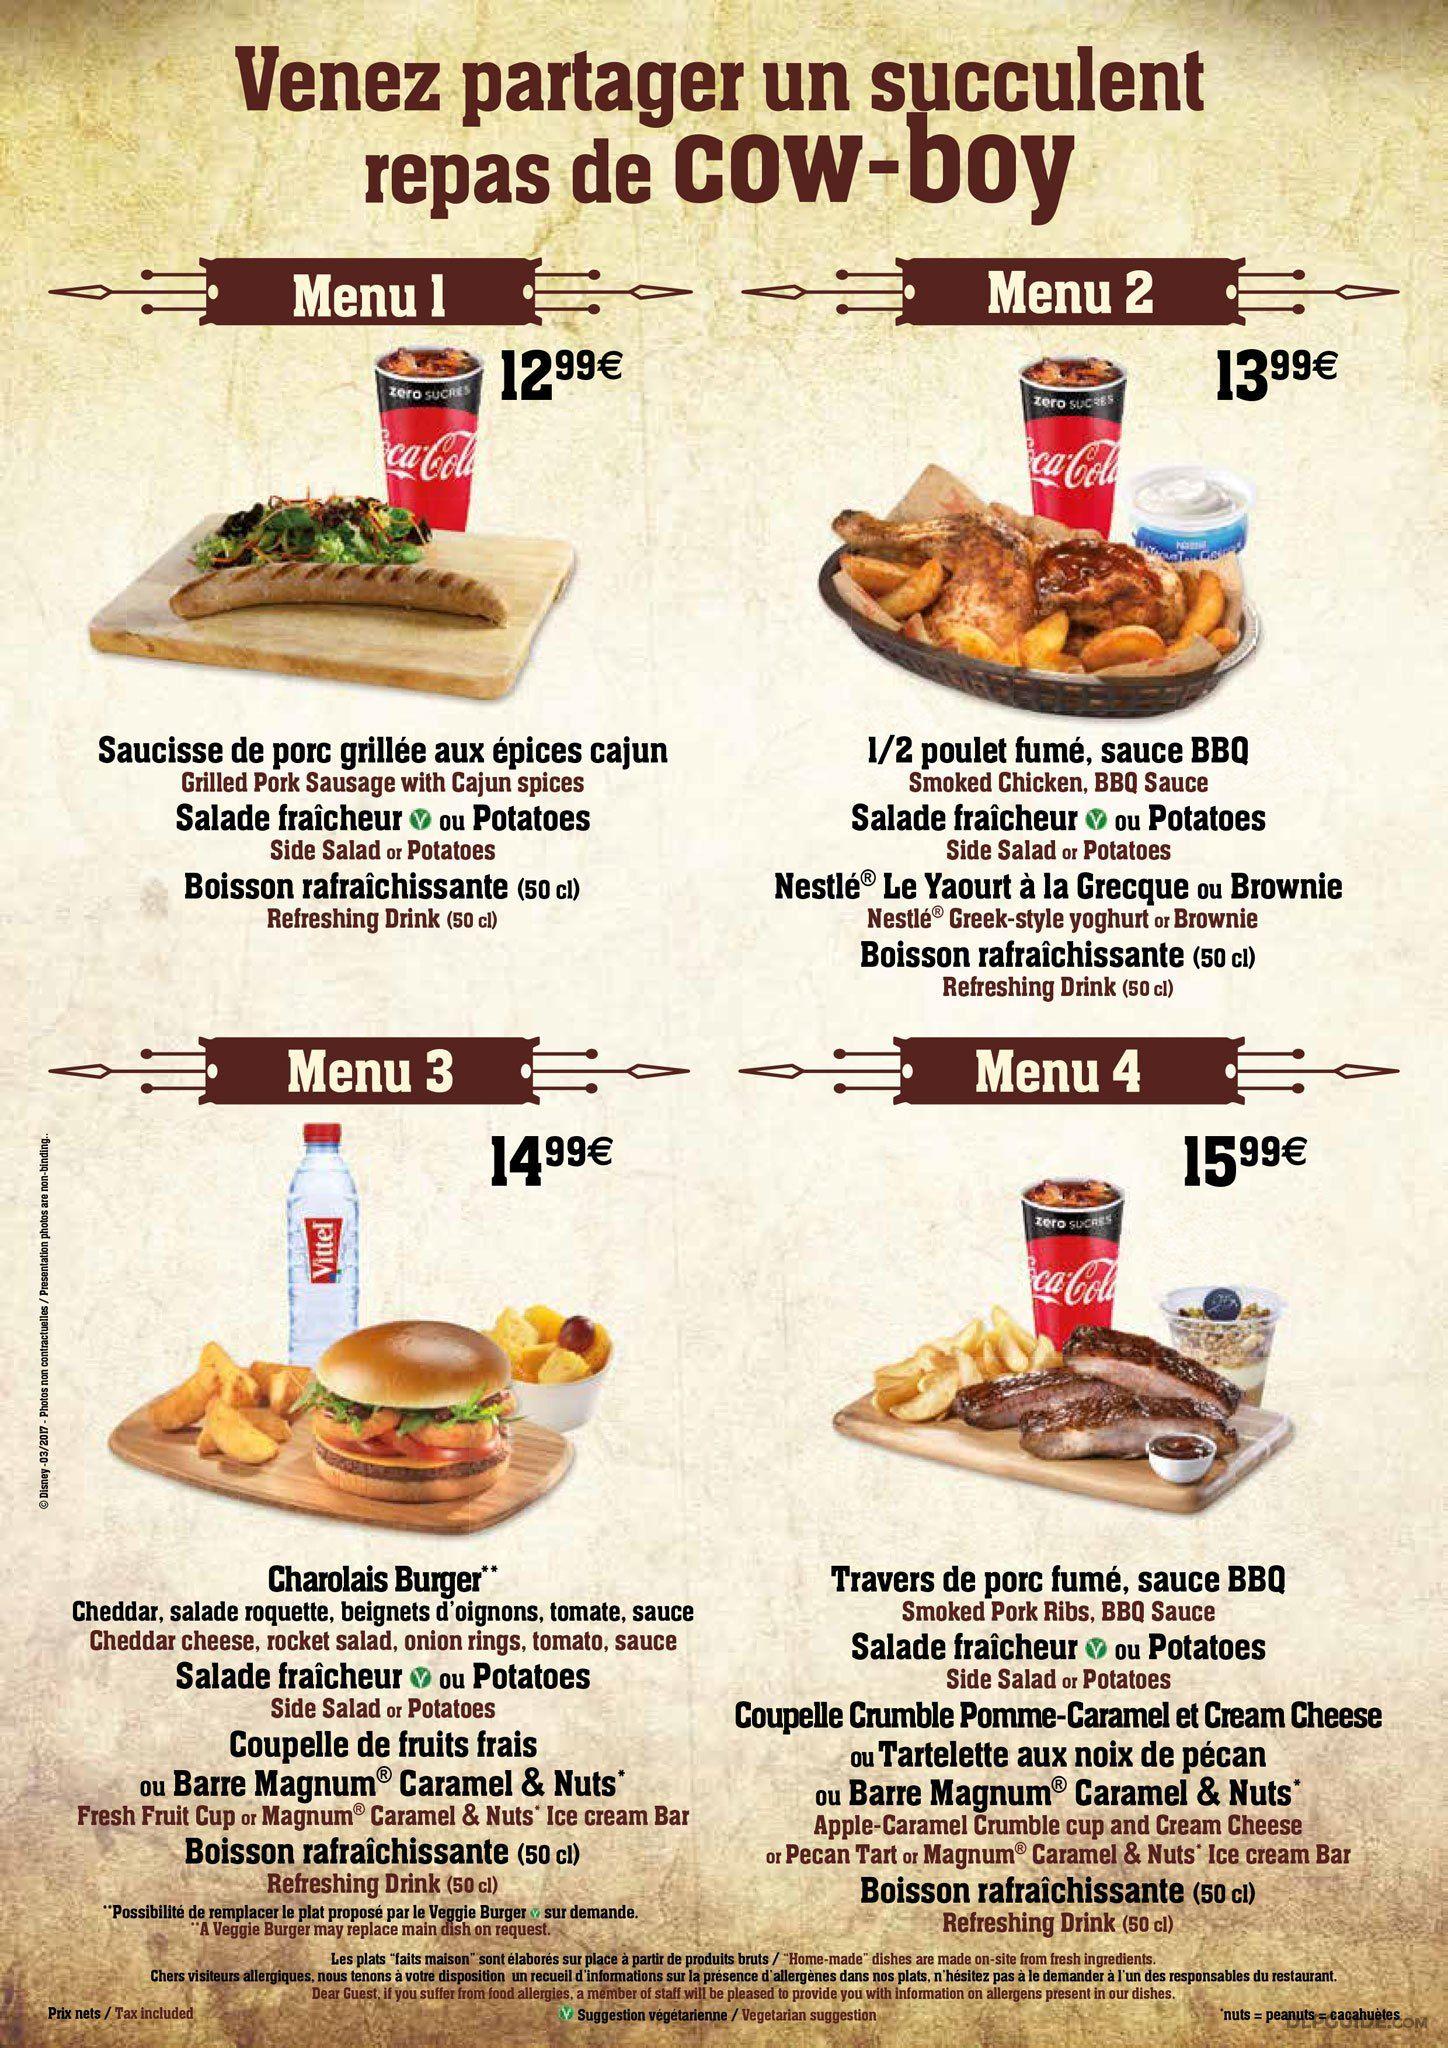 02b8239cc2b85aed4a3f309d1cd0c81d - Plaza Gardens Restaurant Disneyland Paris Menu